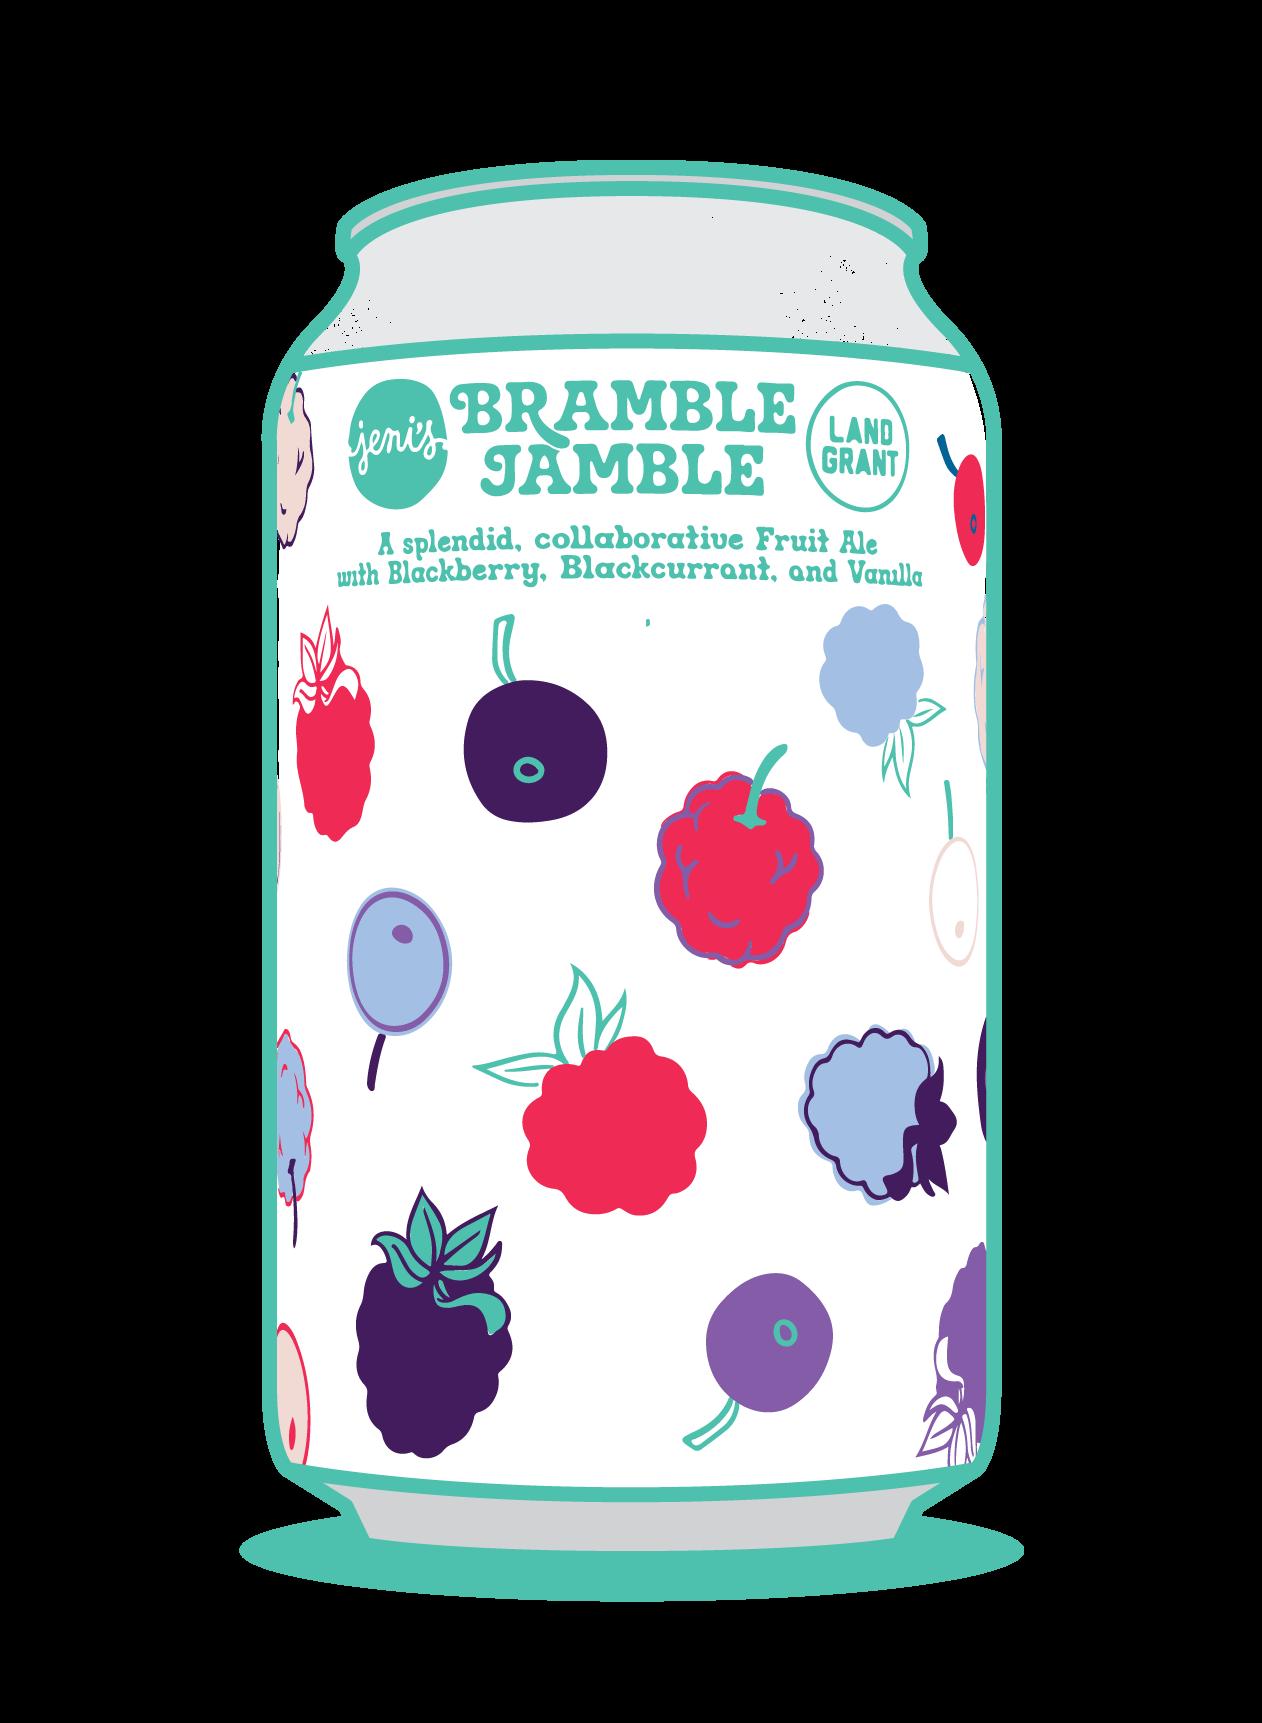 Jenis Bramble Jamble Image